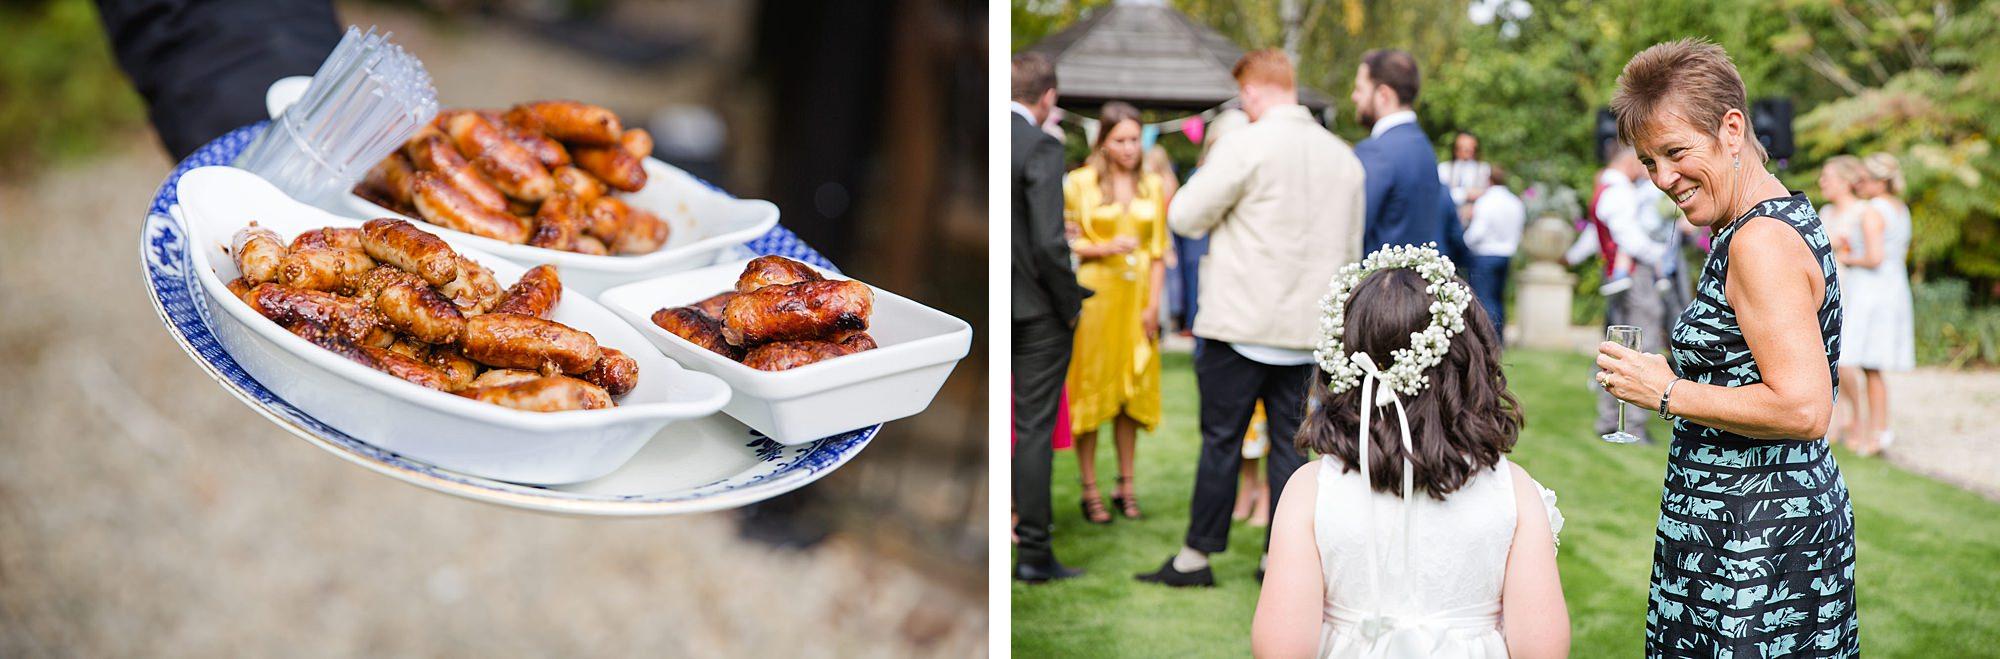 Writtle university college wedding guest enjoy canapés